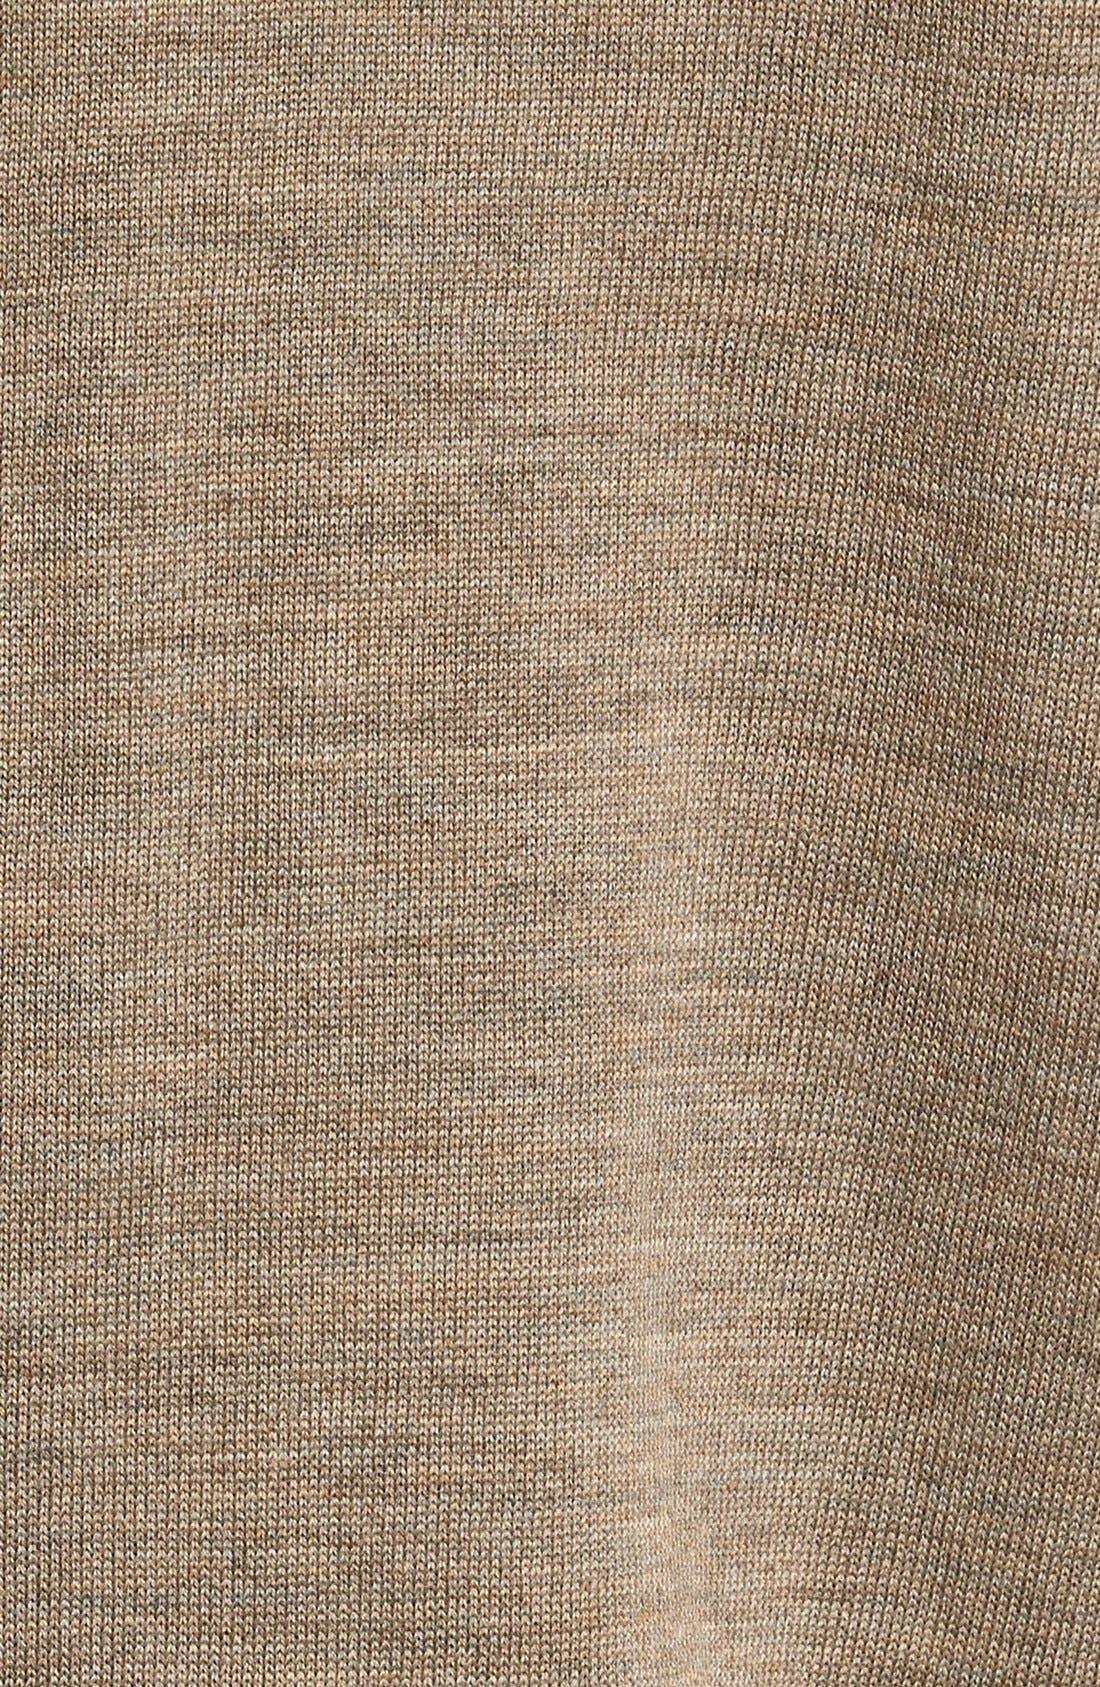 Douglas Quarter Zip Wool Blend Sweater,                             Alternate thumbnail 26, color,